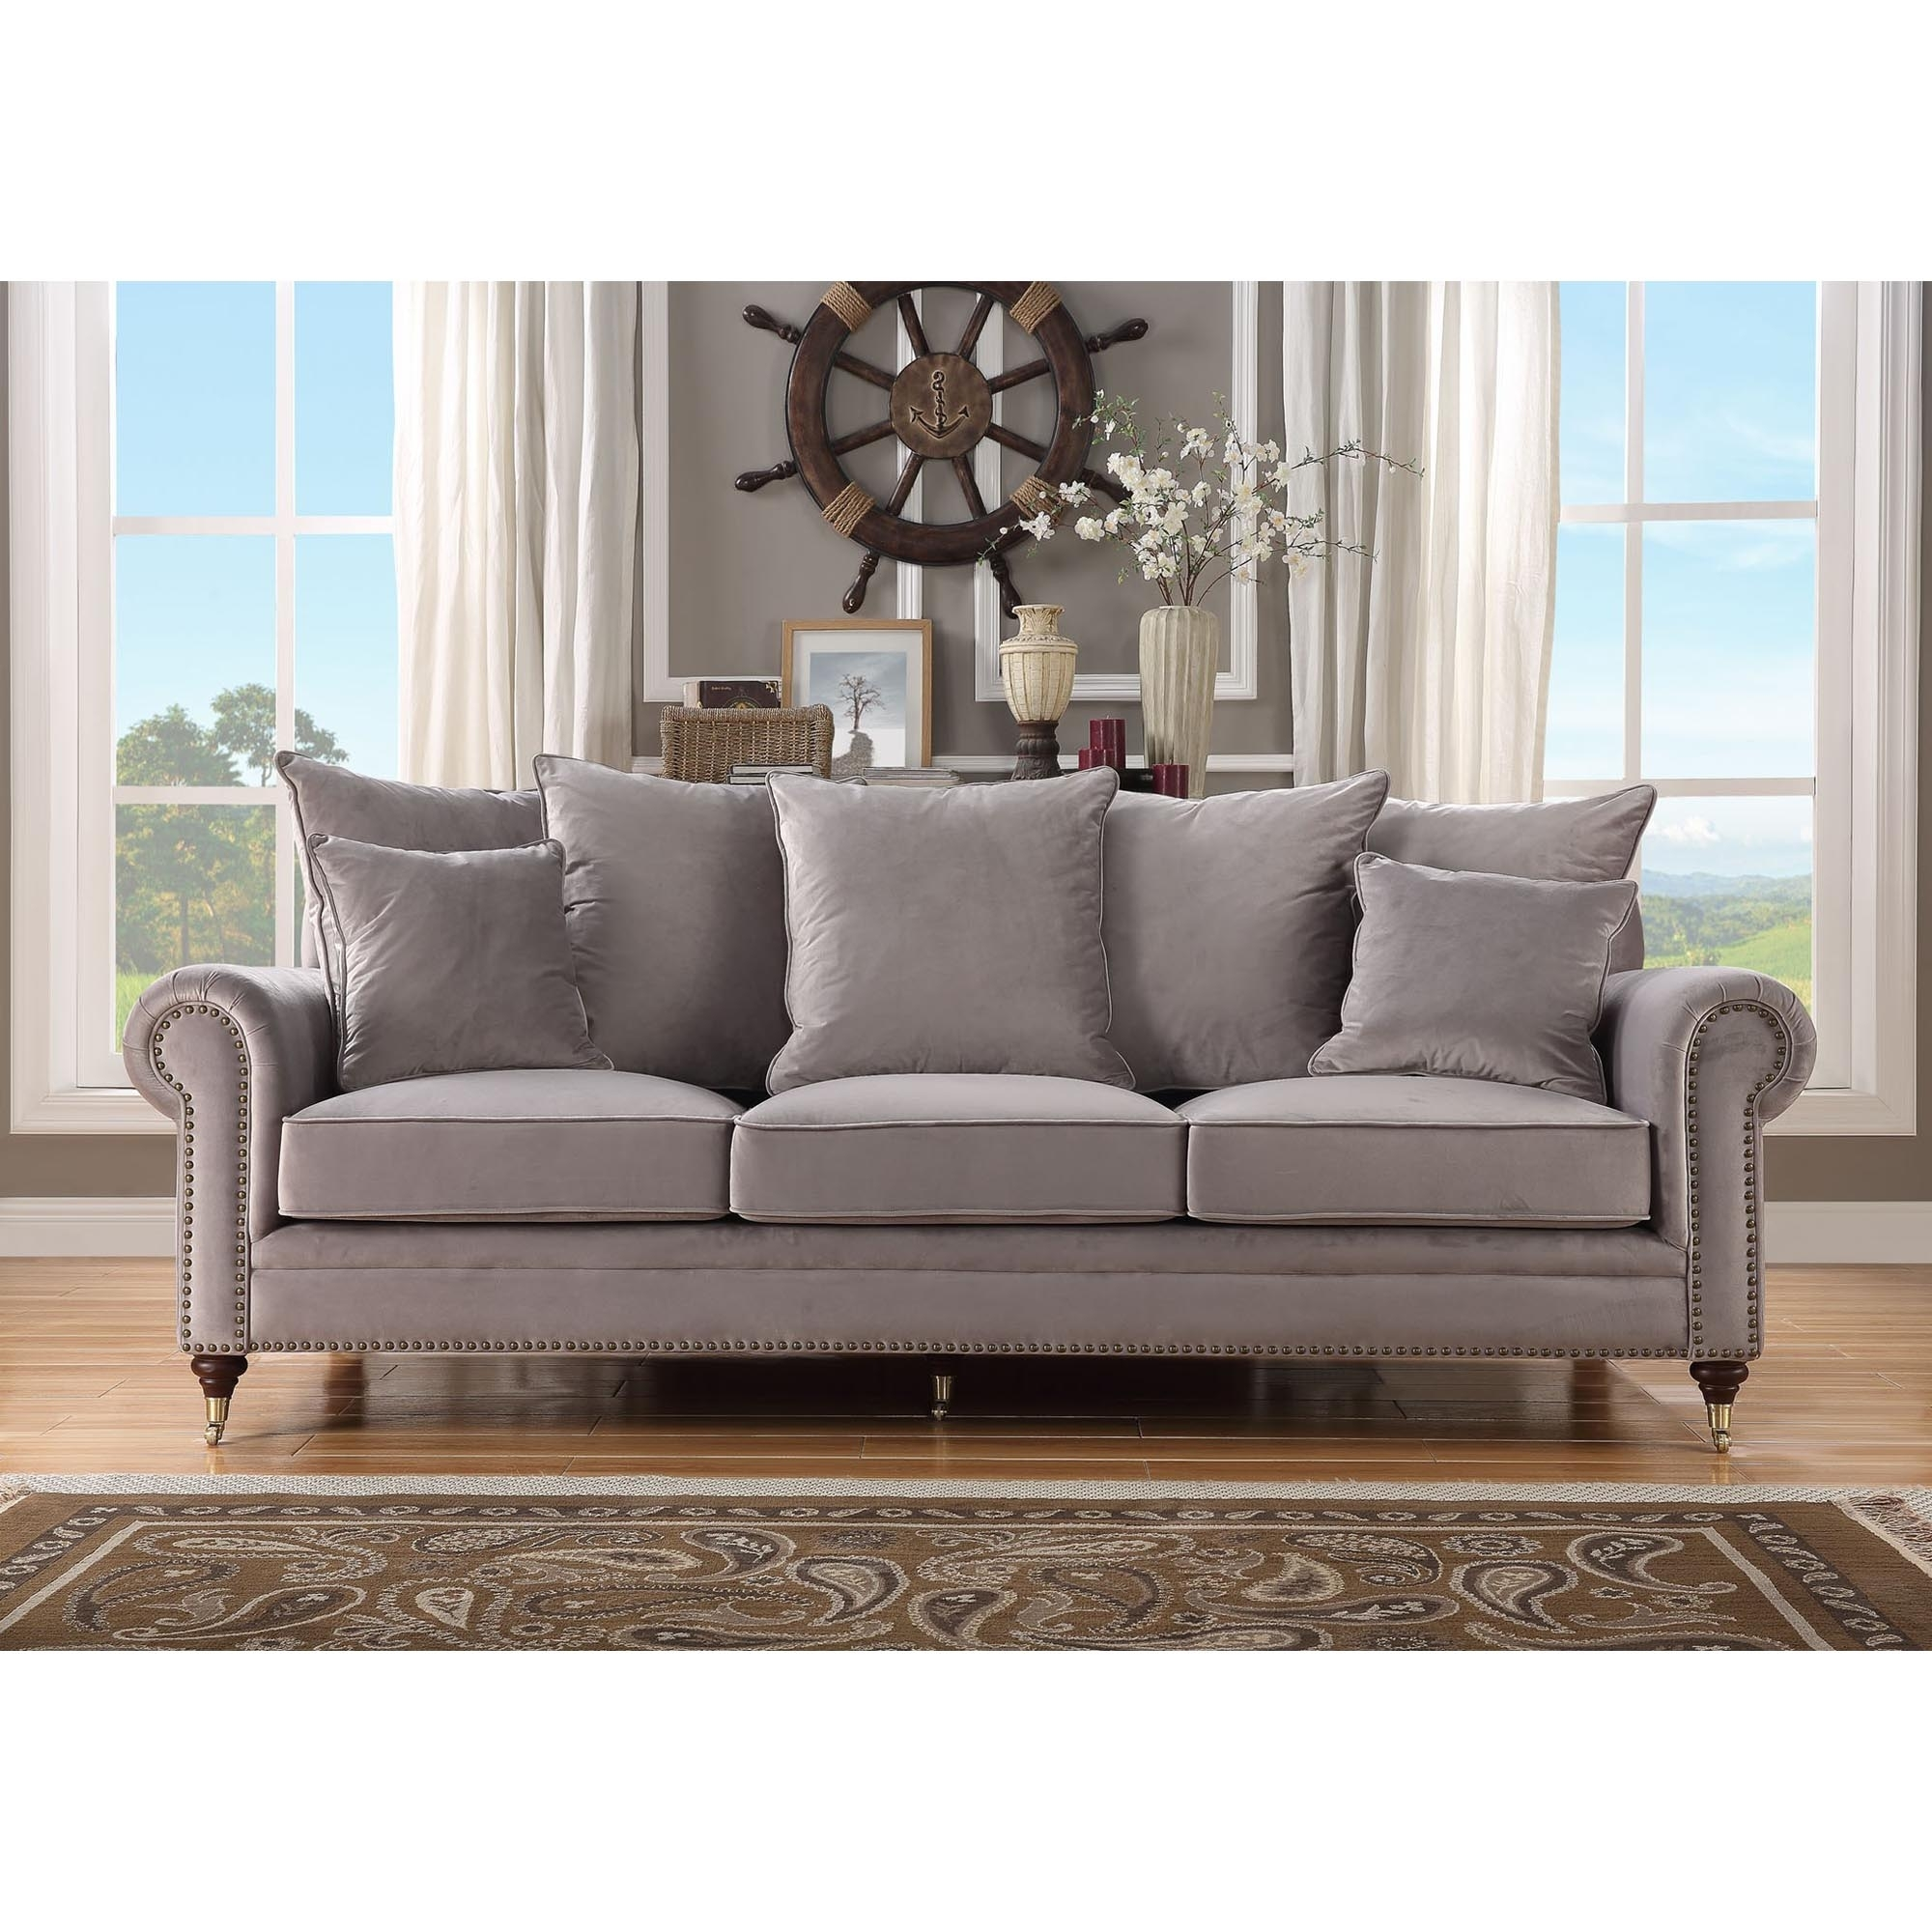 French Sofas | Buy French Sofa | French Sofas Online